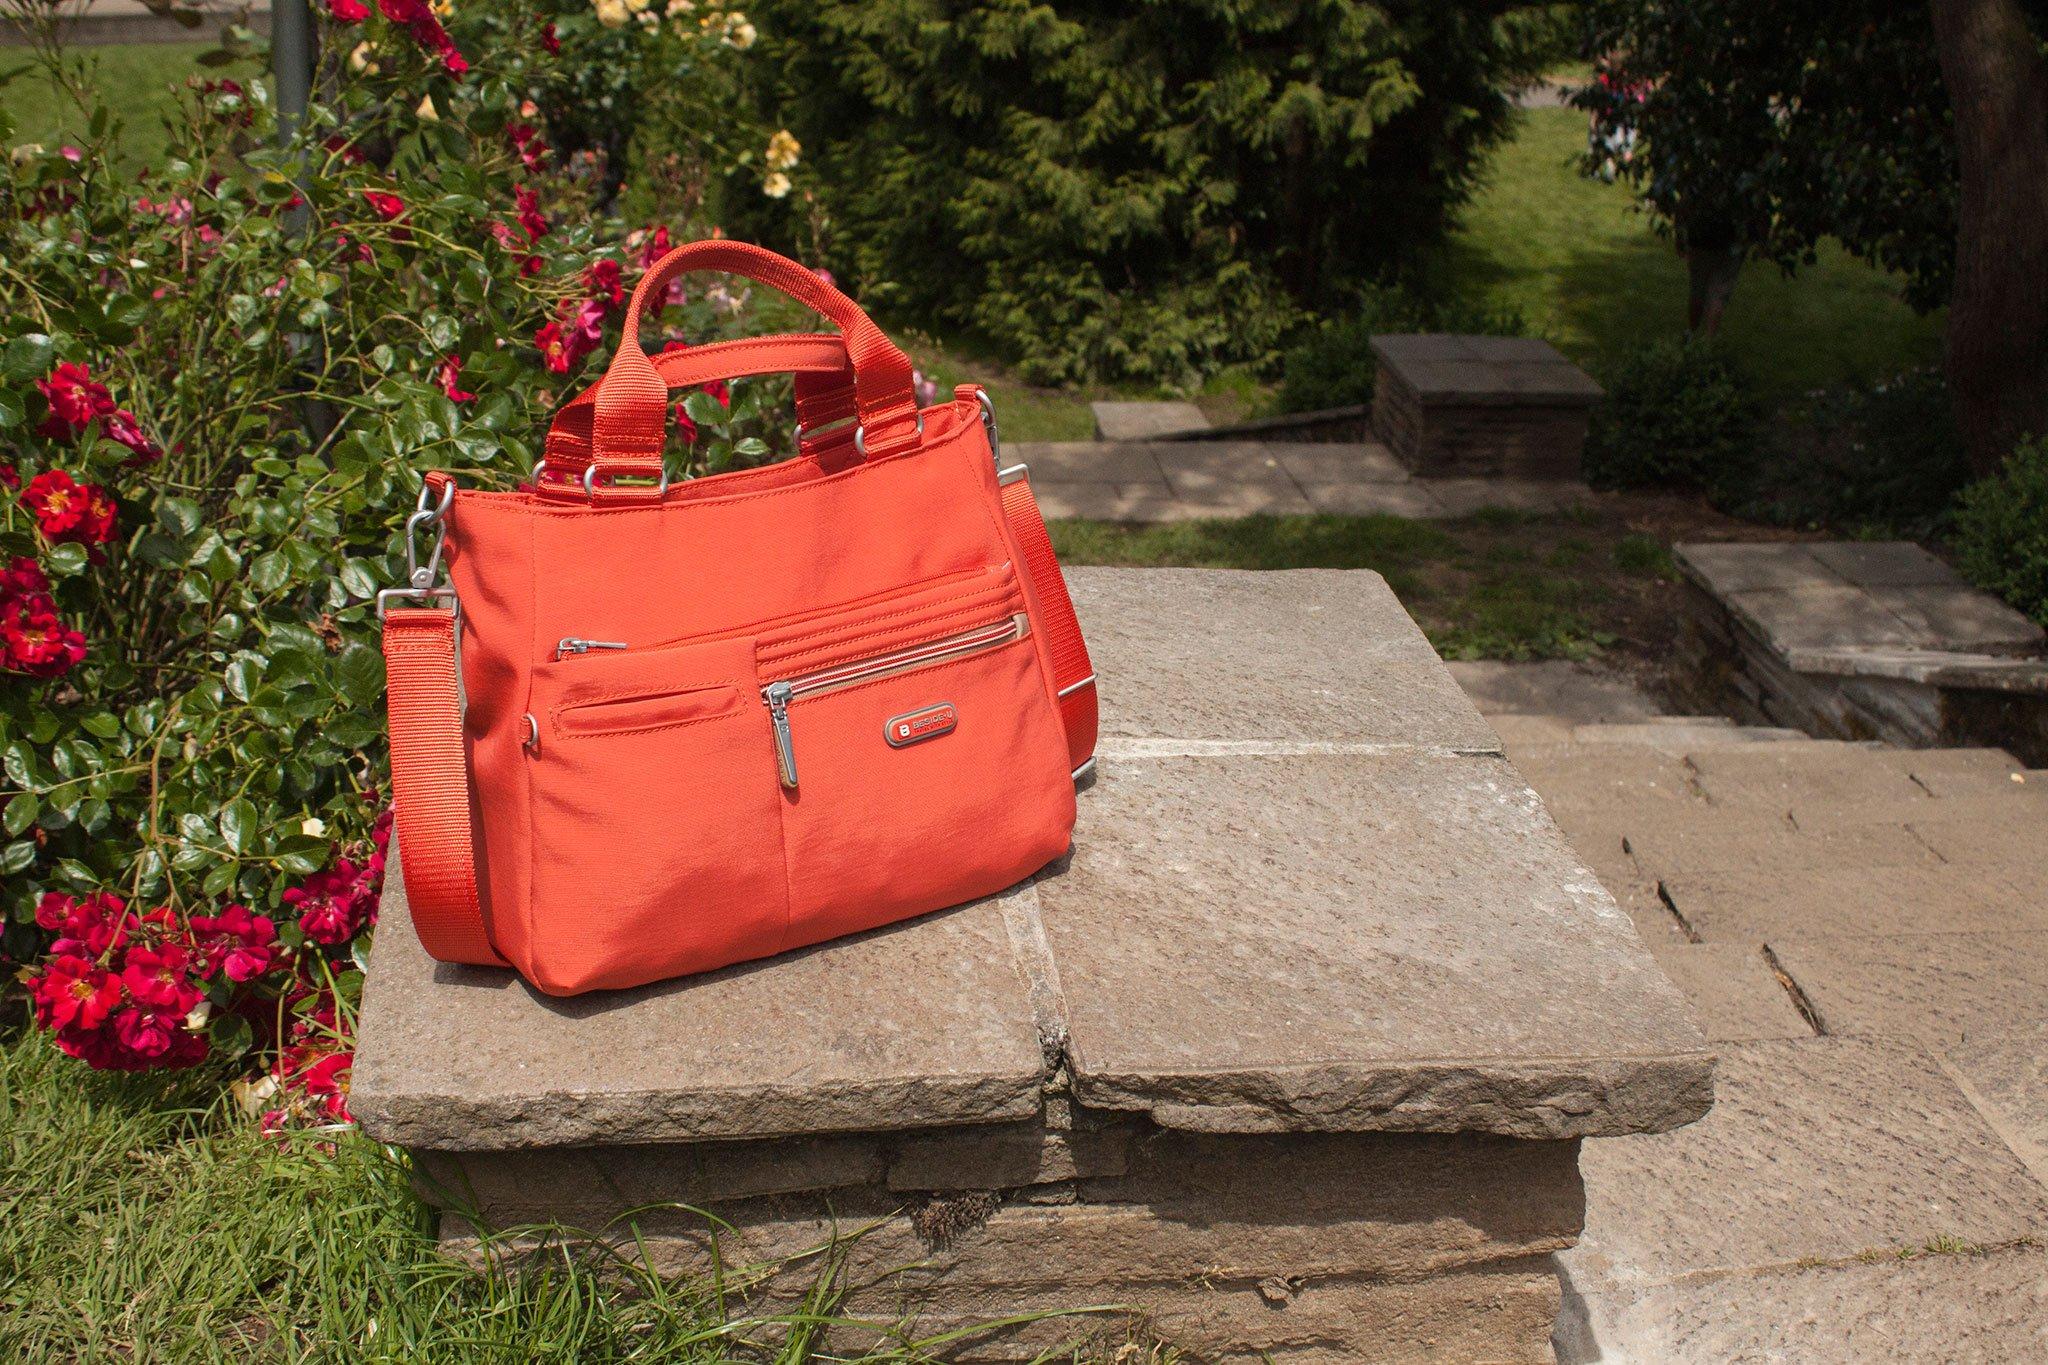 Beside-U Forever Young Brussels Satchel Bag Sweet Orange Your Story Portland